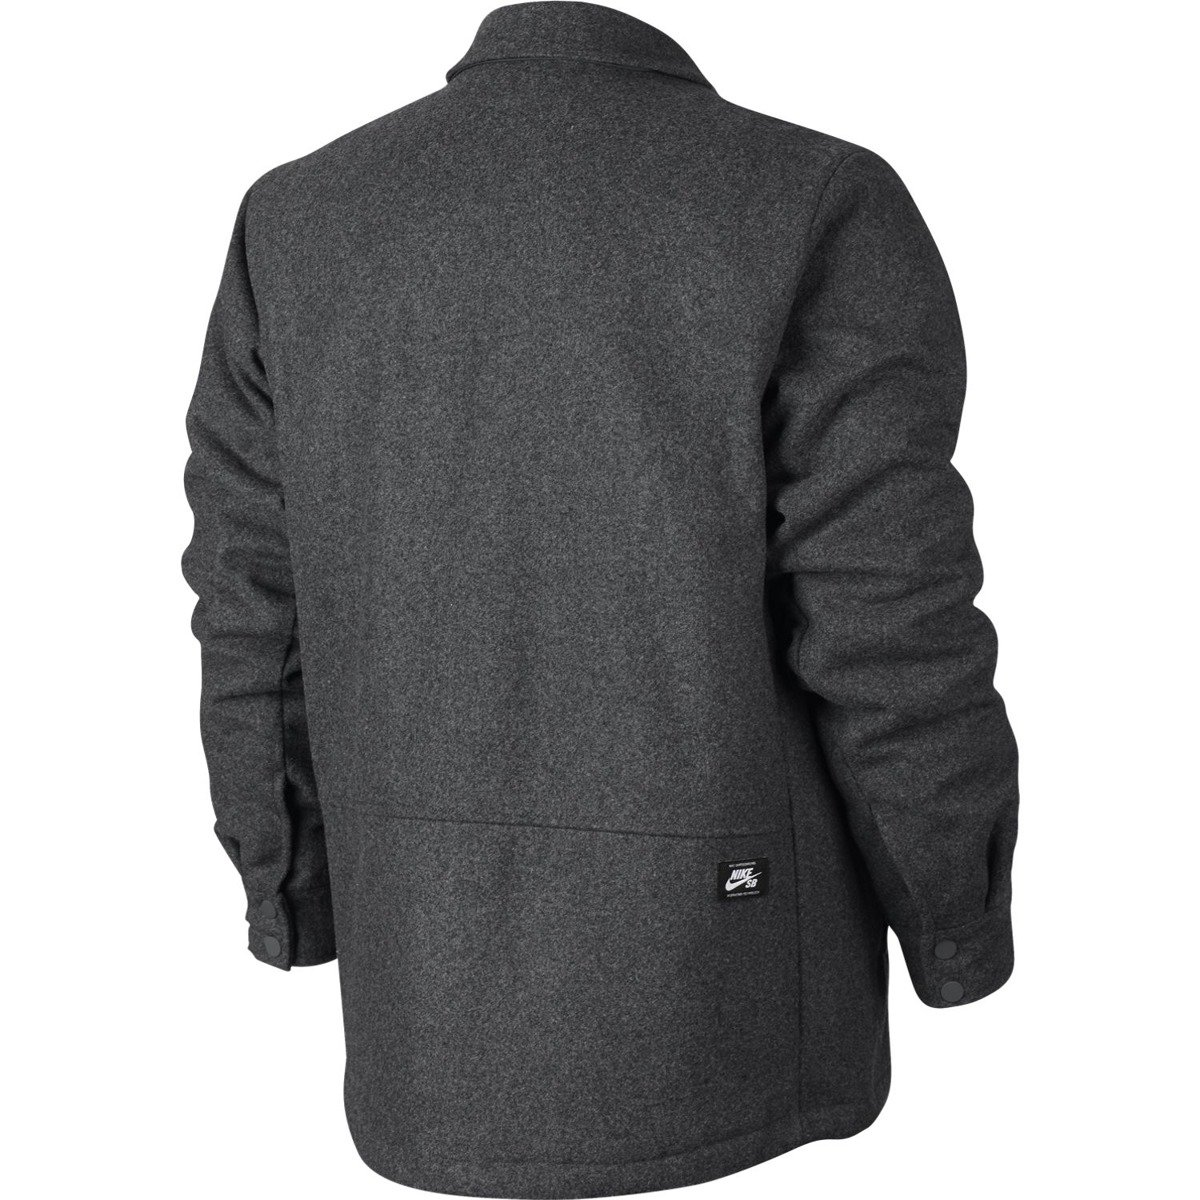 6eb04b3266 ... Nike SB Wool Coaches Jacket Charcoal Heathr black Click to zoom